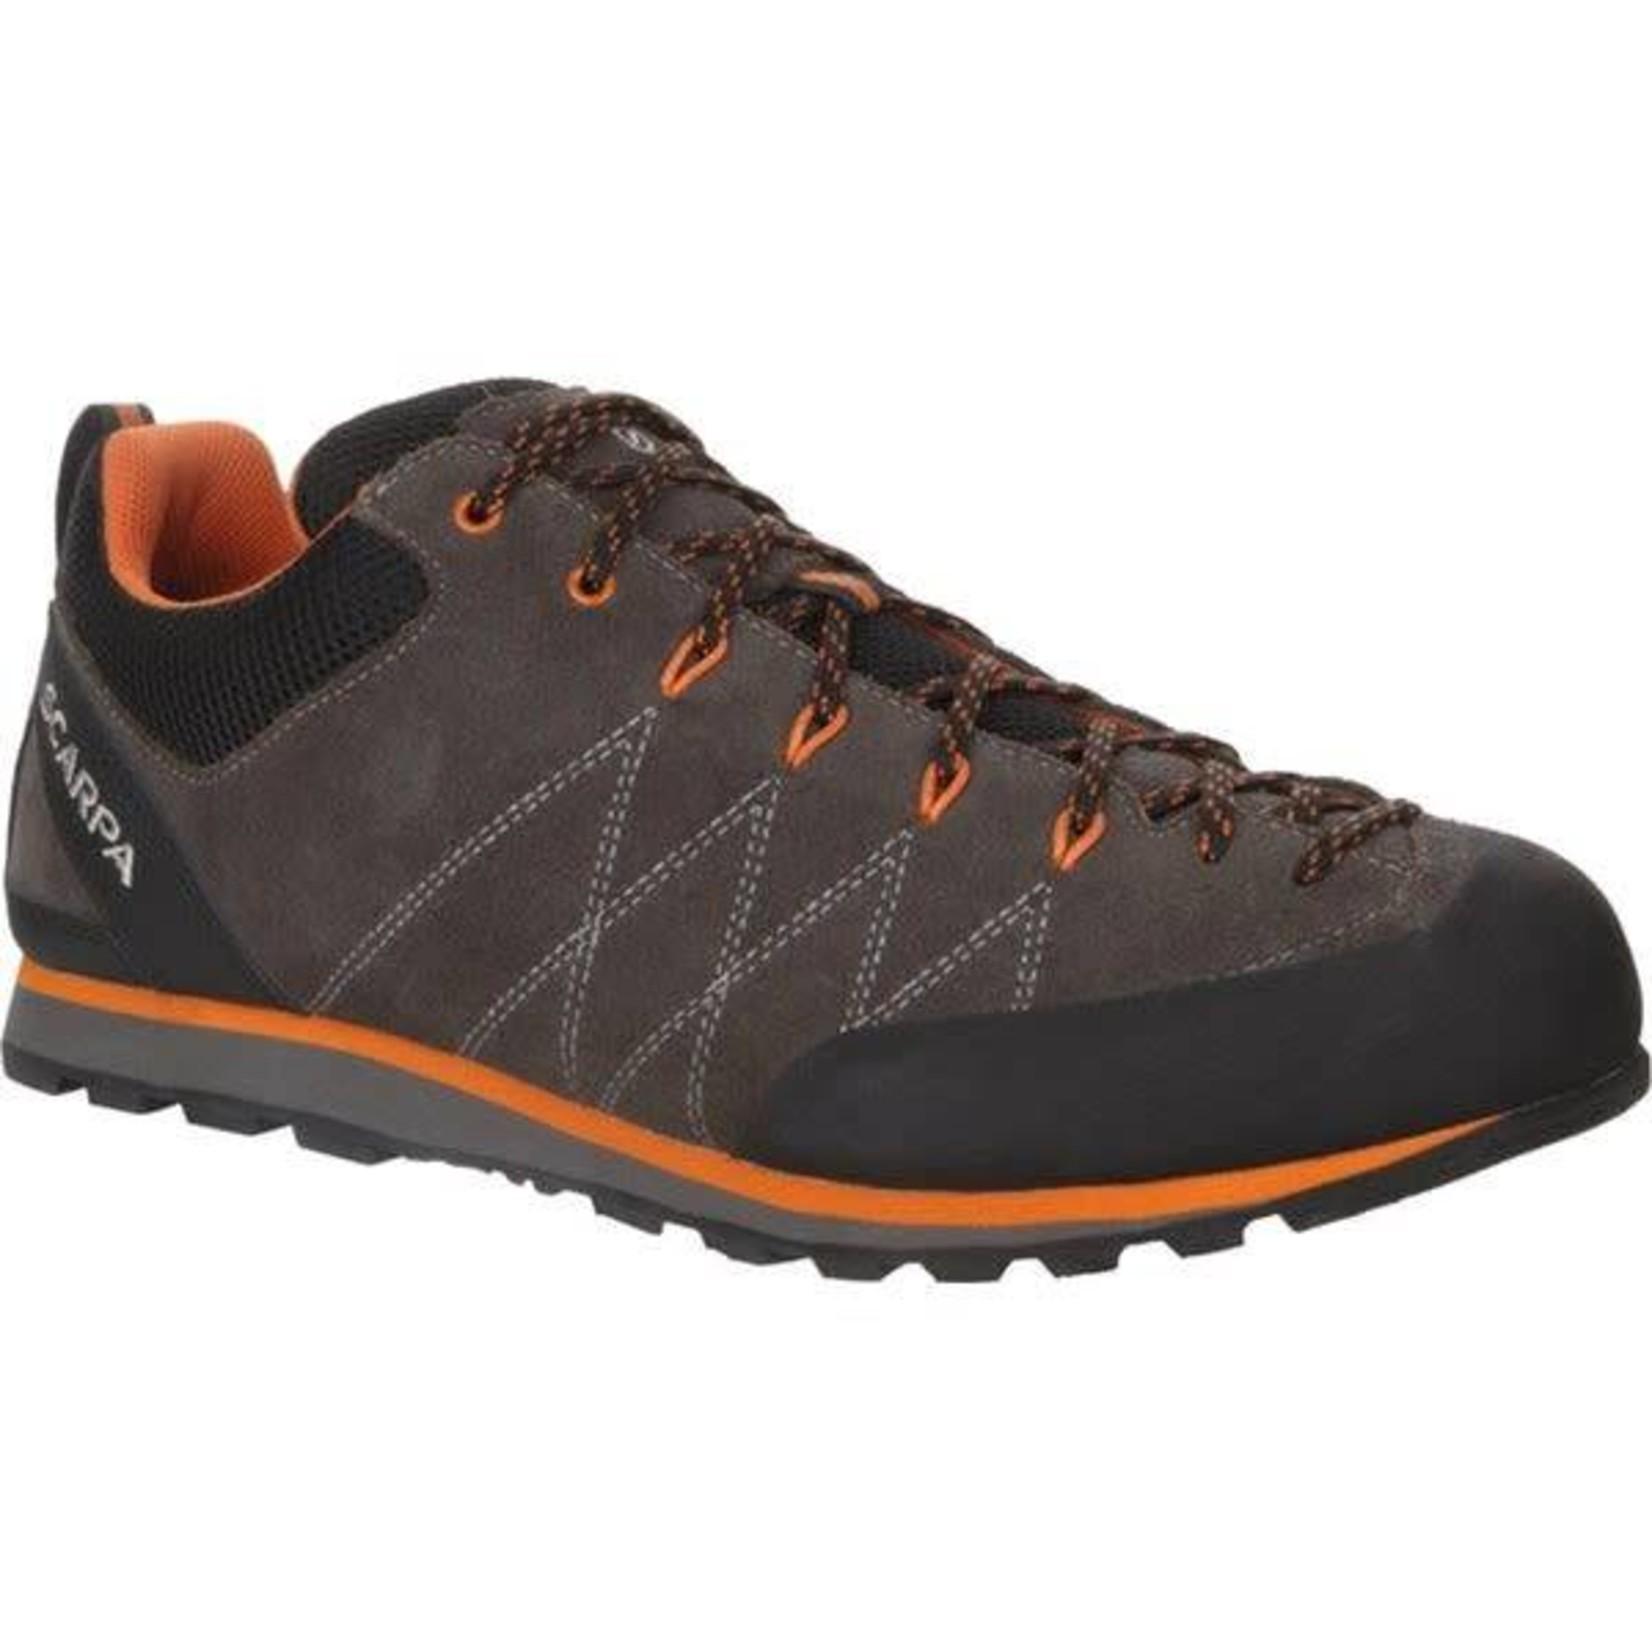 Scarpa Scarpa Crux Approach Shoes